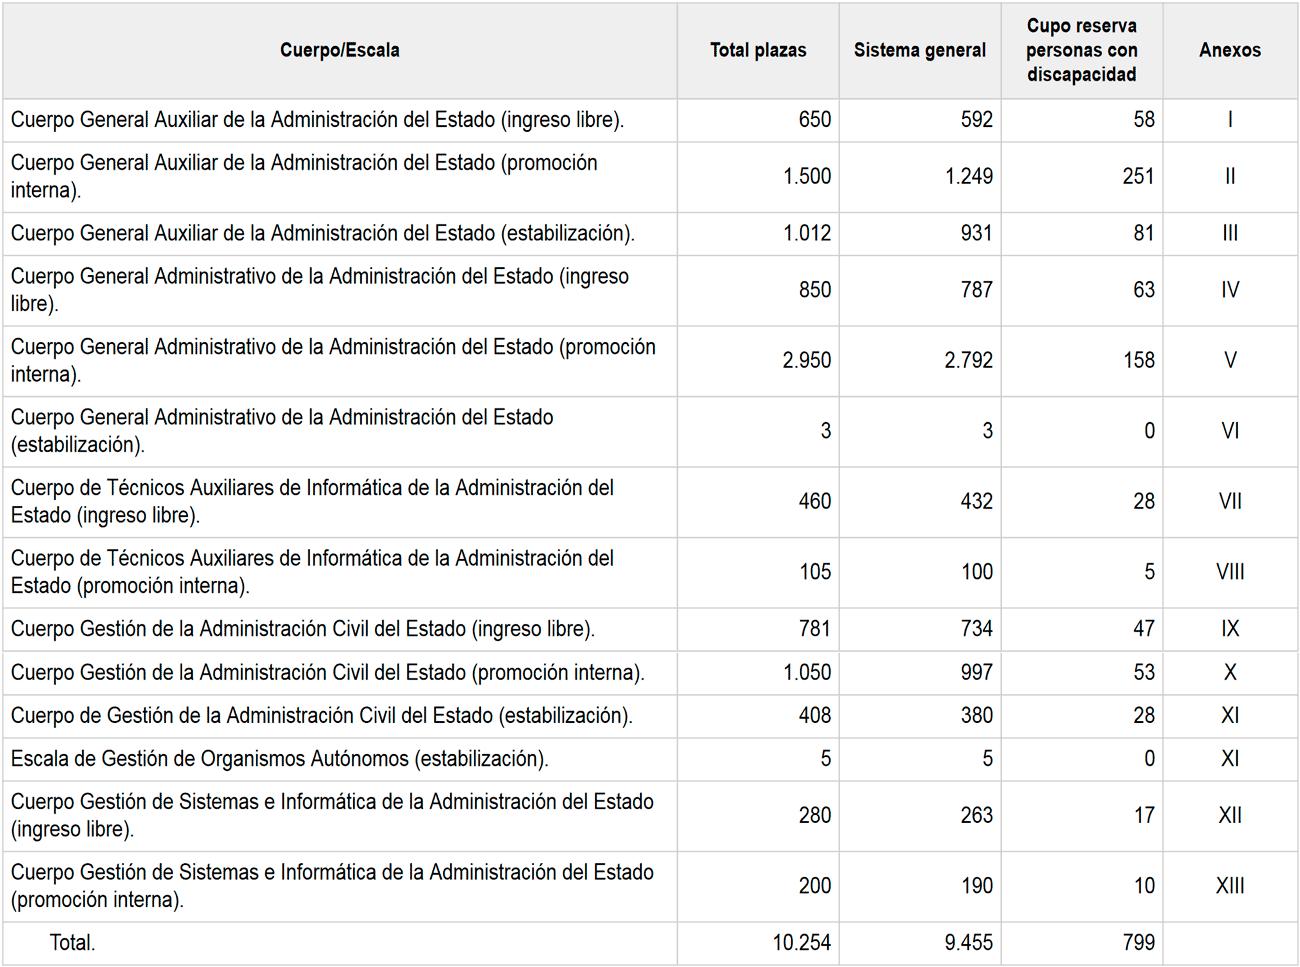 Oferta de empleo público AGE 2021